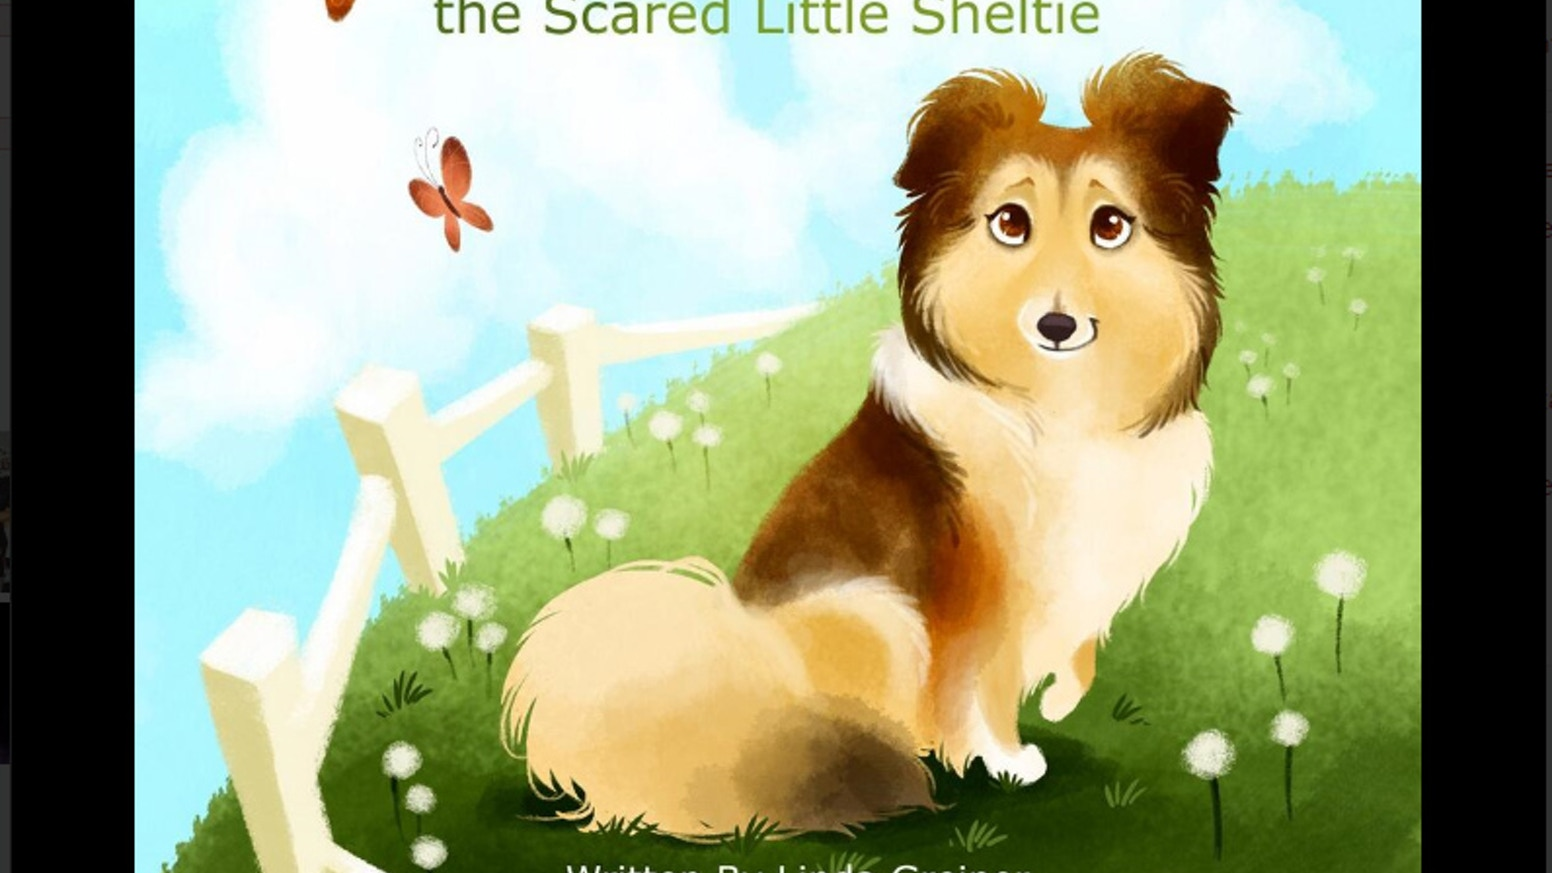 sashi the scared little sheltie by linda greiner kickstarter